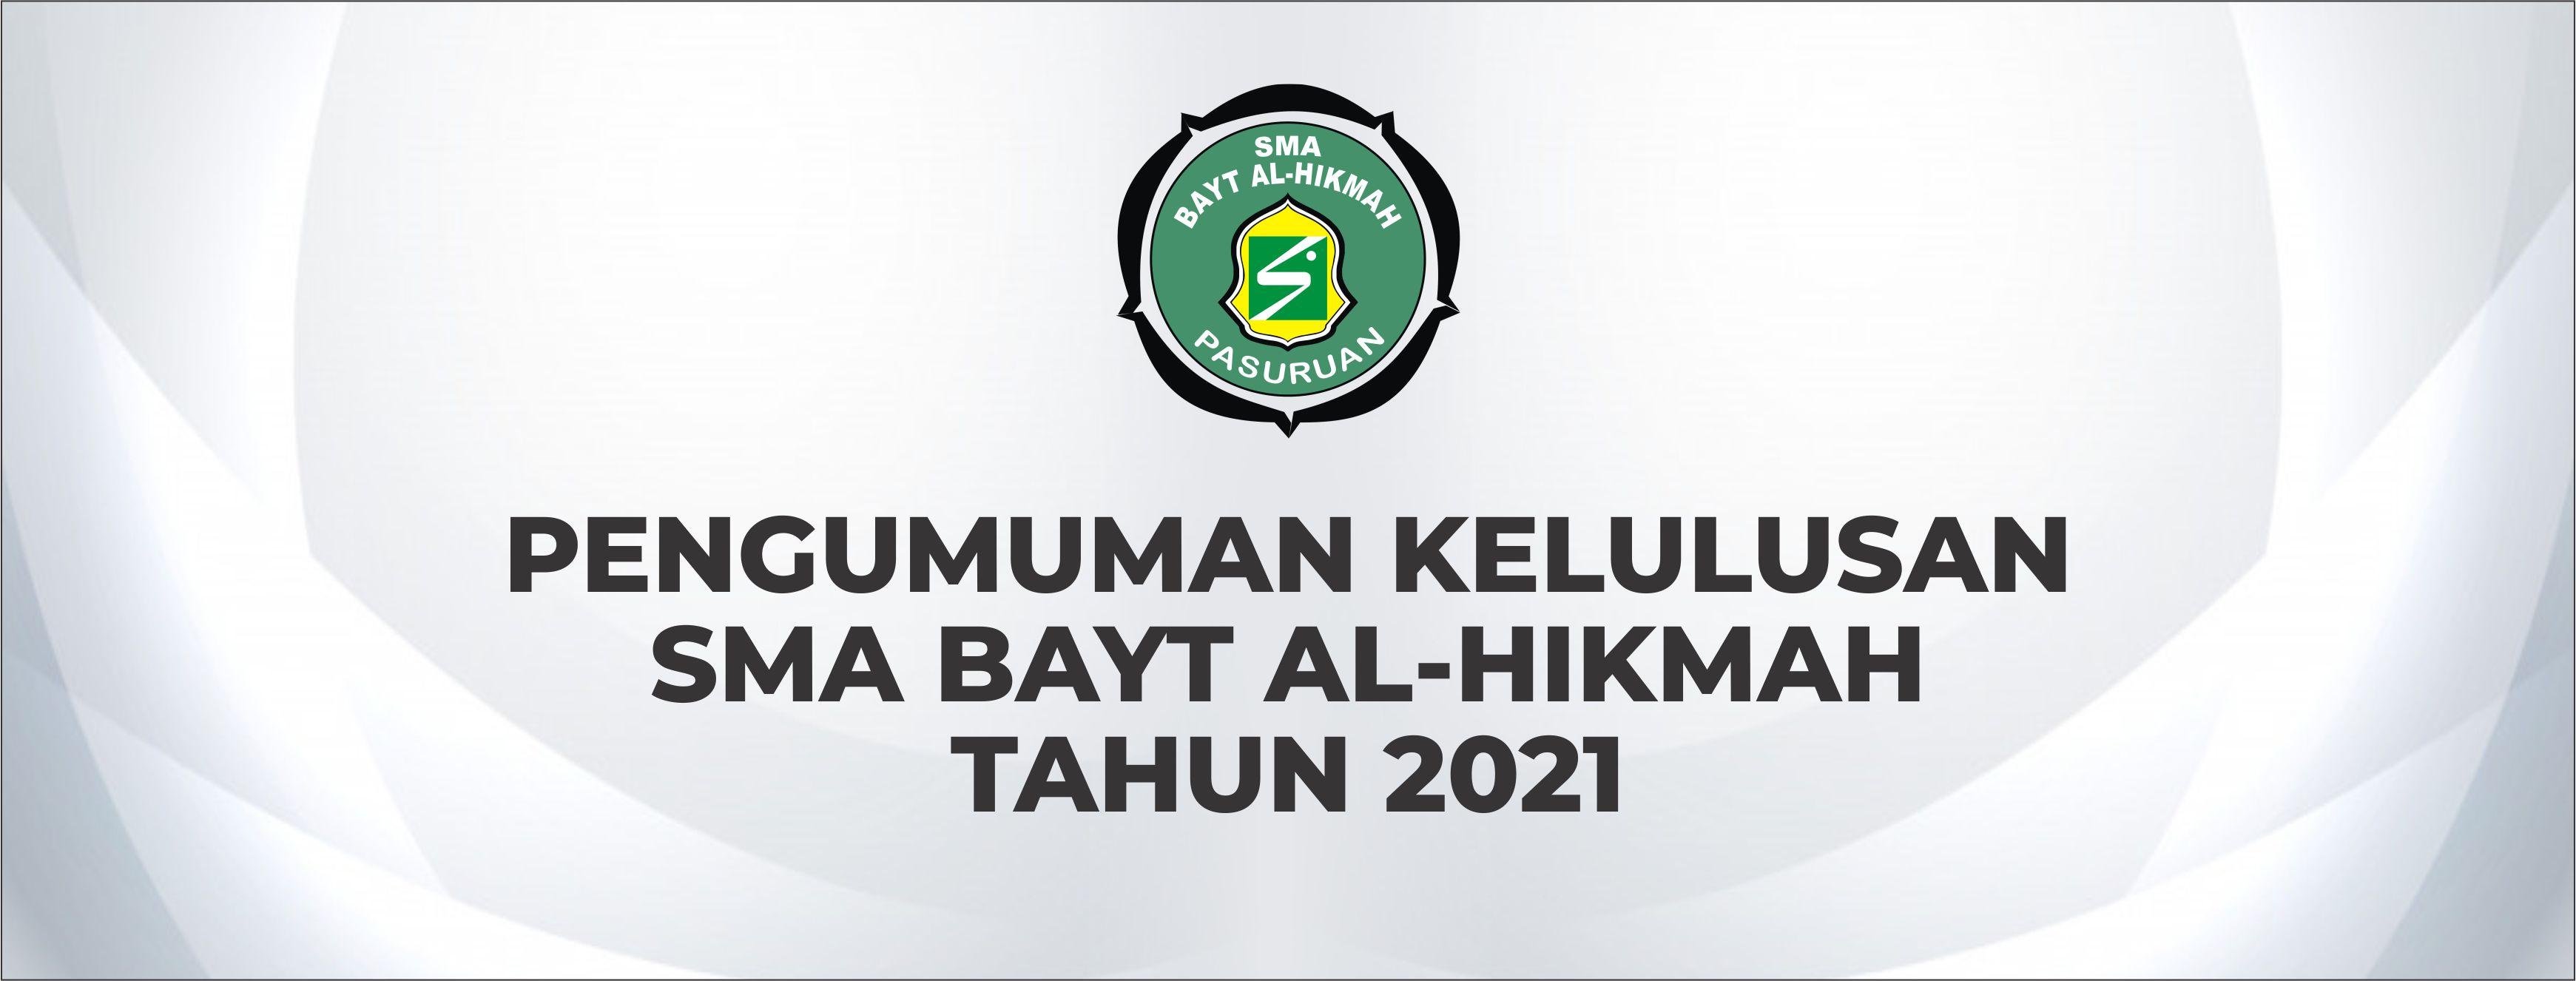 PENGUMUMAN KELULUSAN SANTRI SMA BAYT AL-HIKMAH TAHUN PELAJARAN 2020/2021